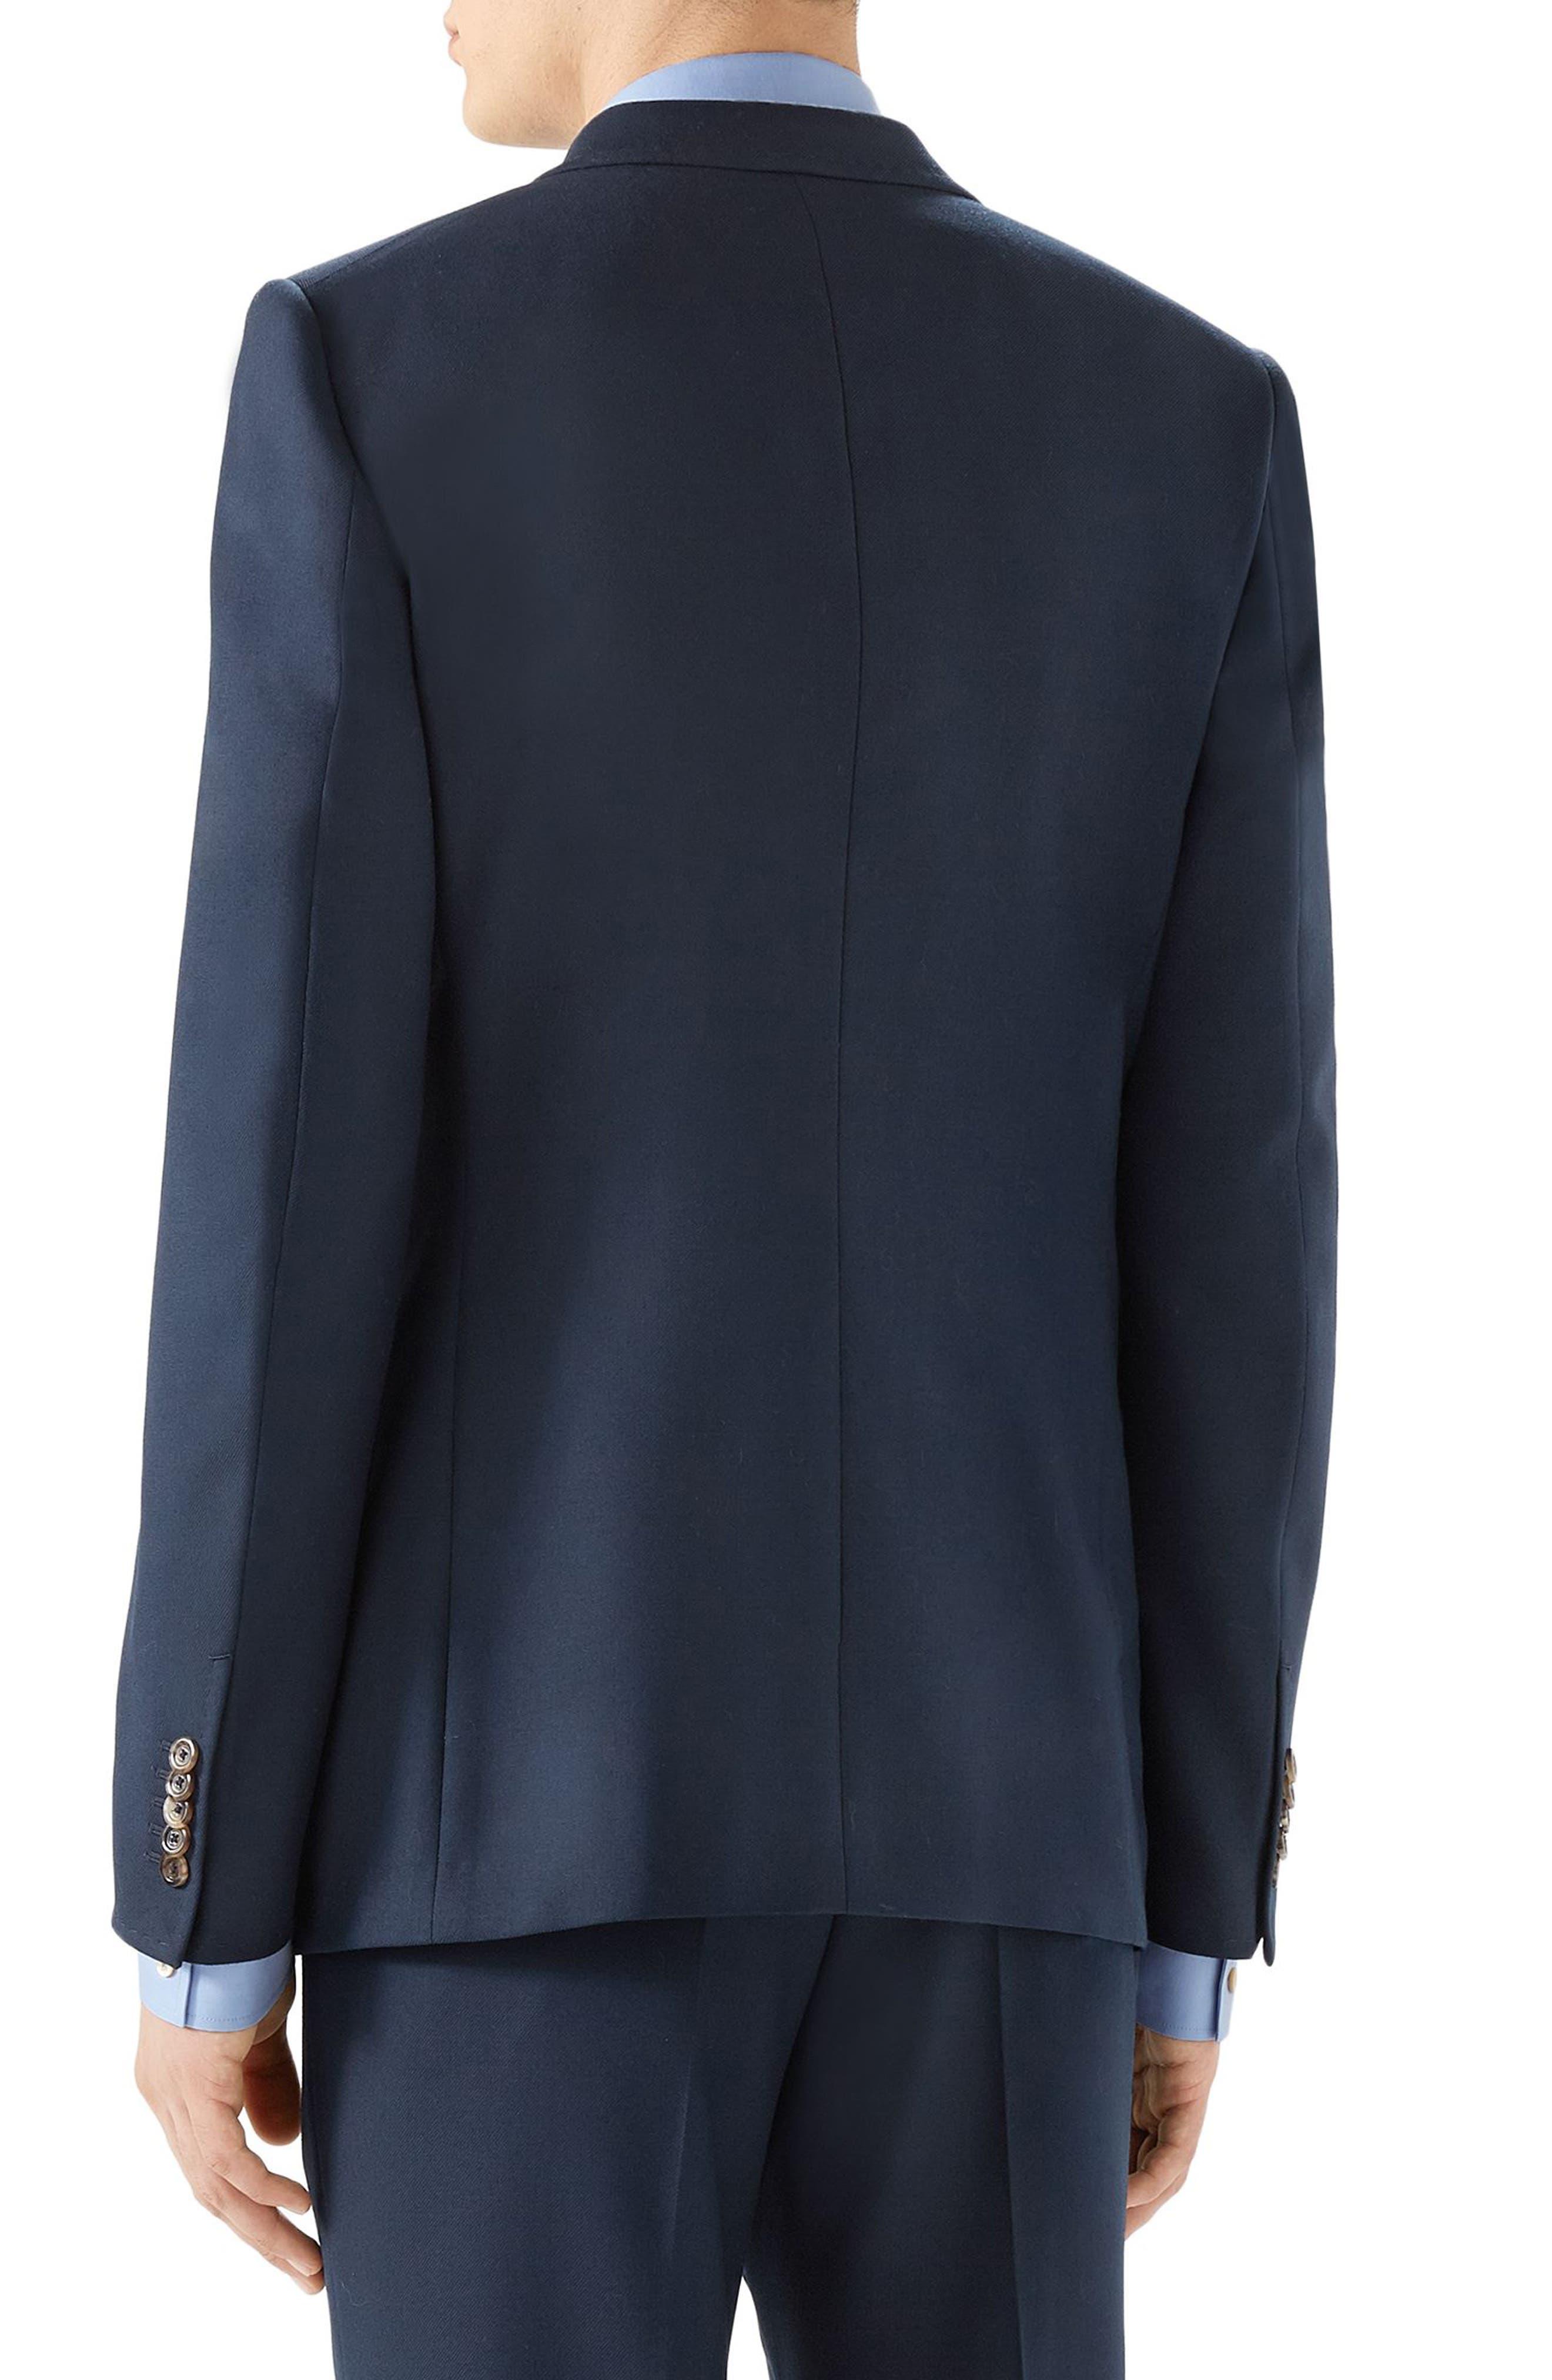 Peak Lapel Sport Coat,                             Alternate thumbnail 2, color,                             BLUE